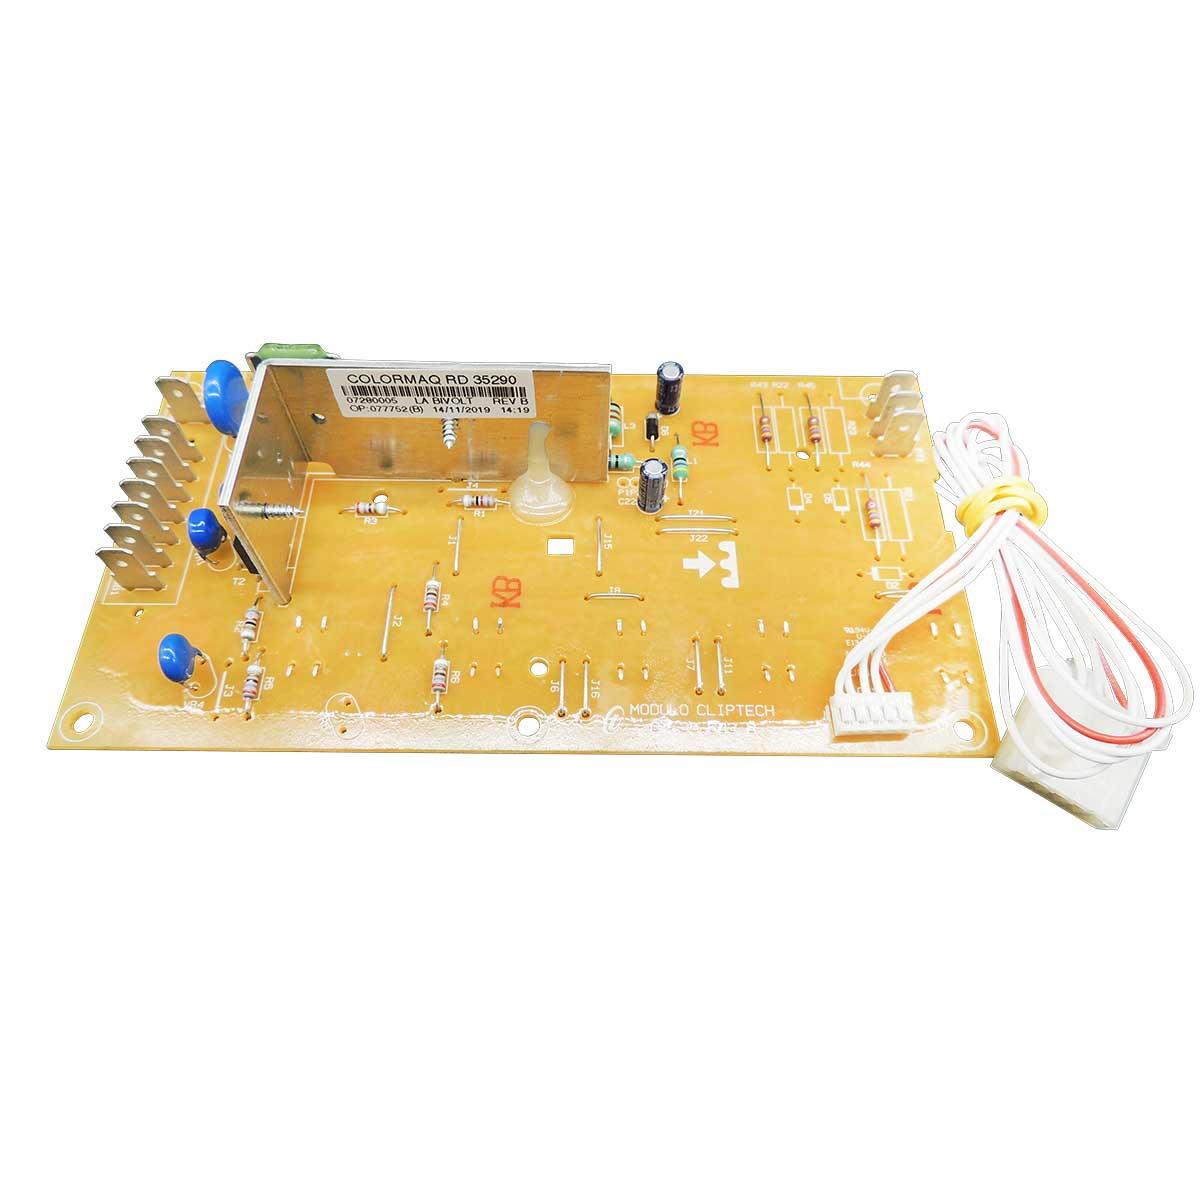 Placa Eletrônica Original para Lavadoras Colormaq  LCA11KG Bivolt 07280.005.1